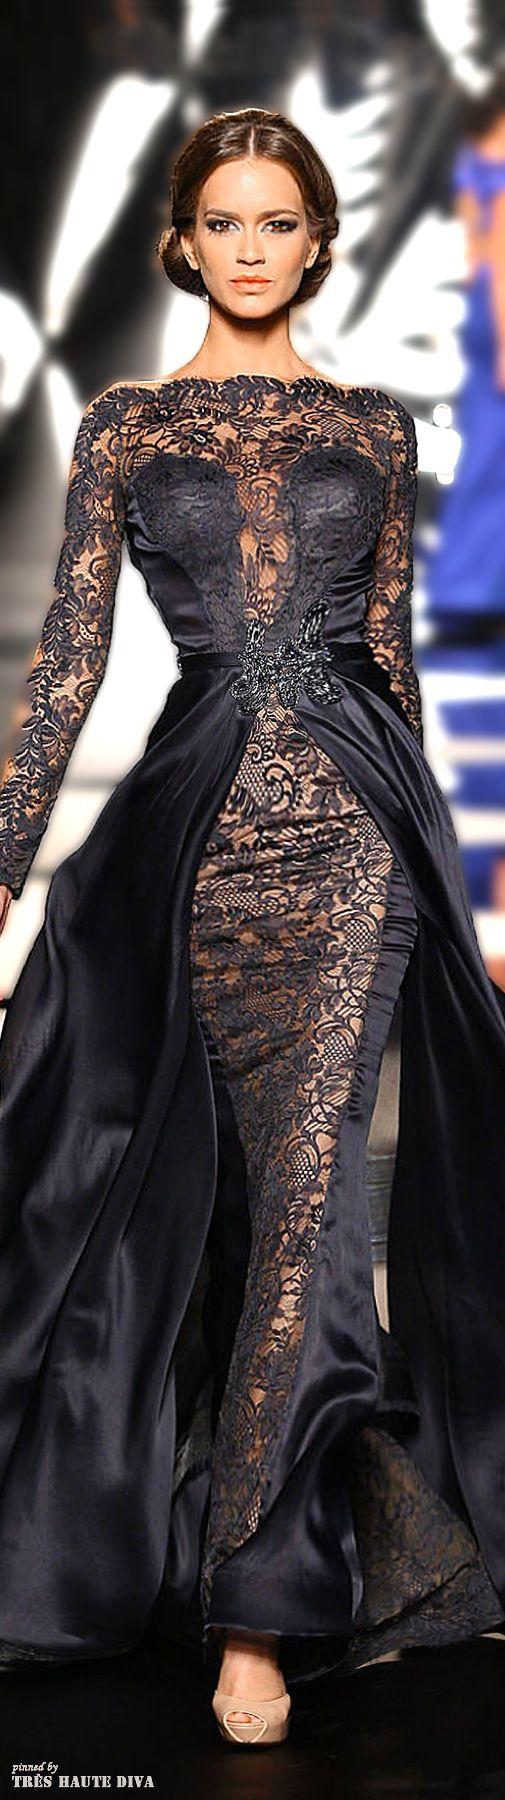 black-dress-vestido-preto-nada-básico-para-festas-de-fim-de-ano 16